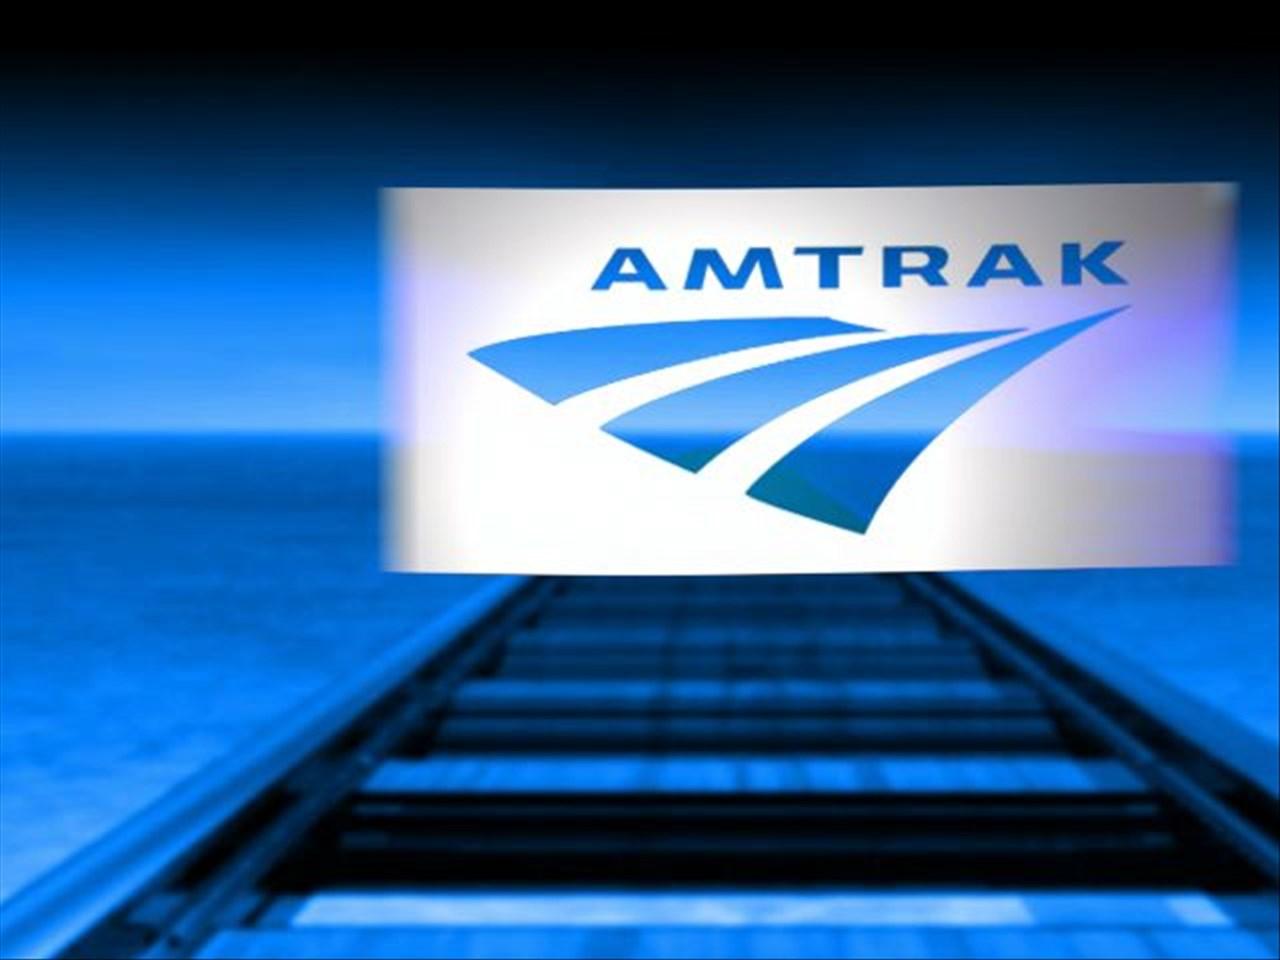 Amtrak_155571